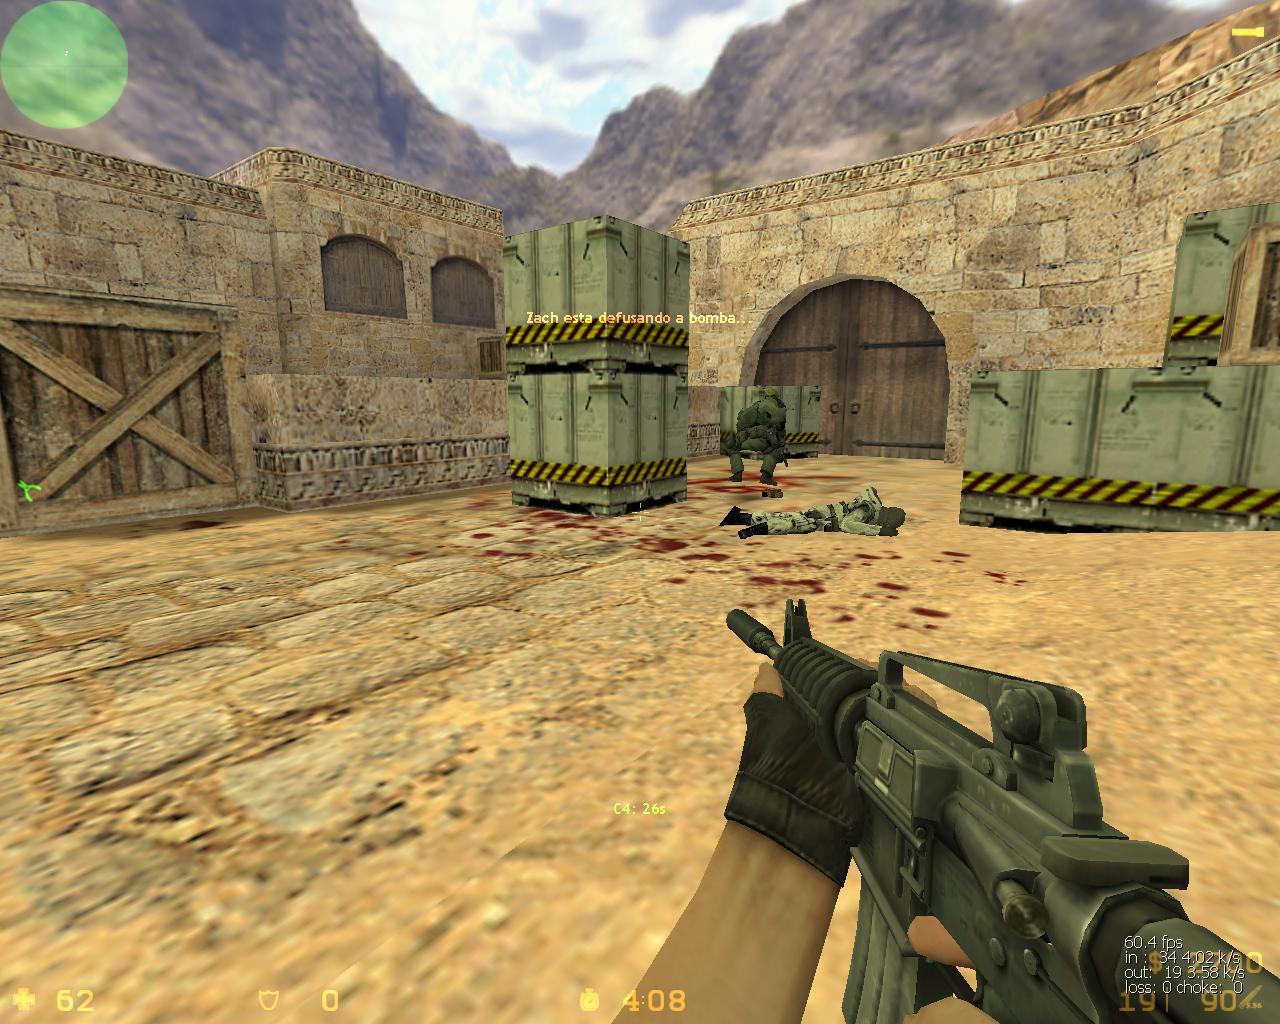 counter strike full game download